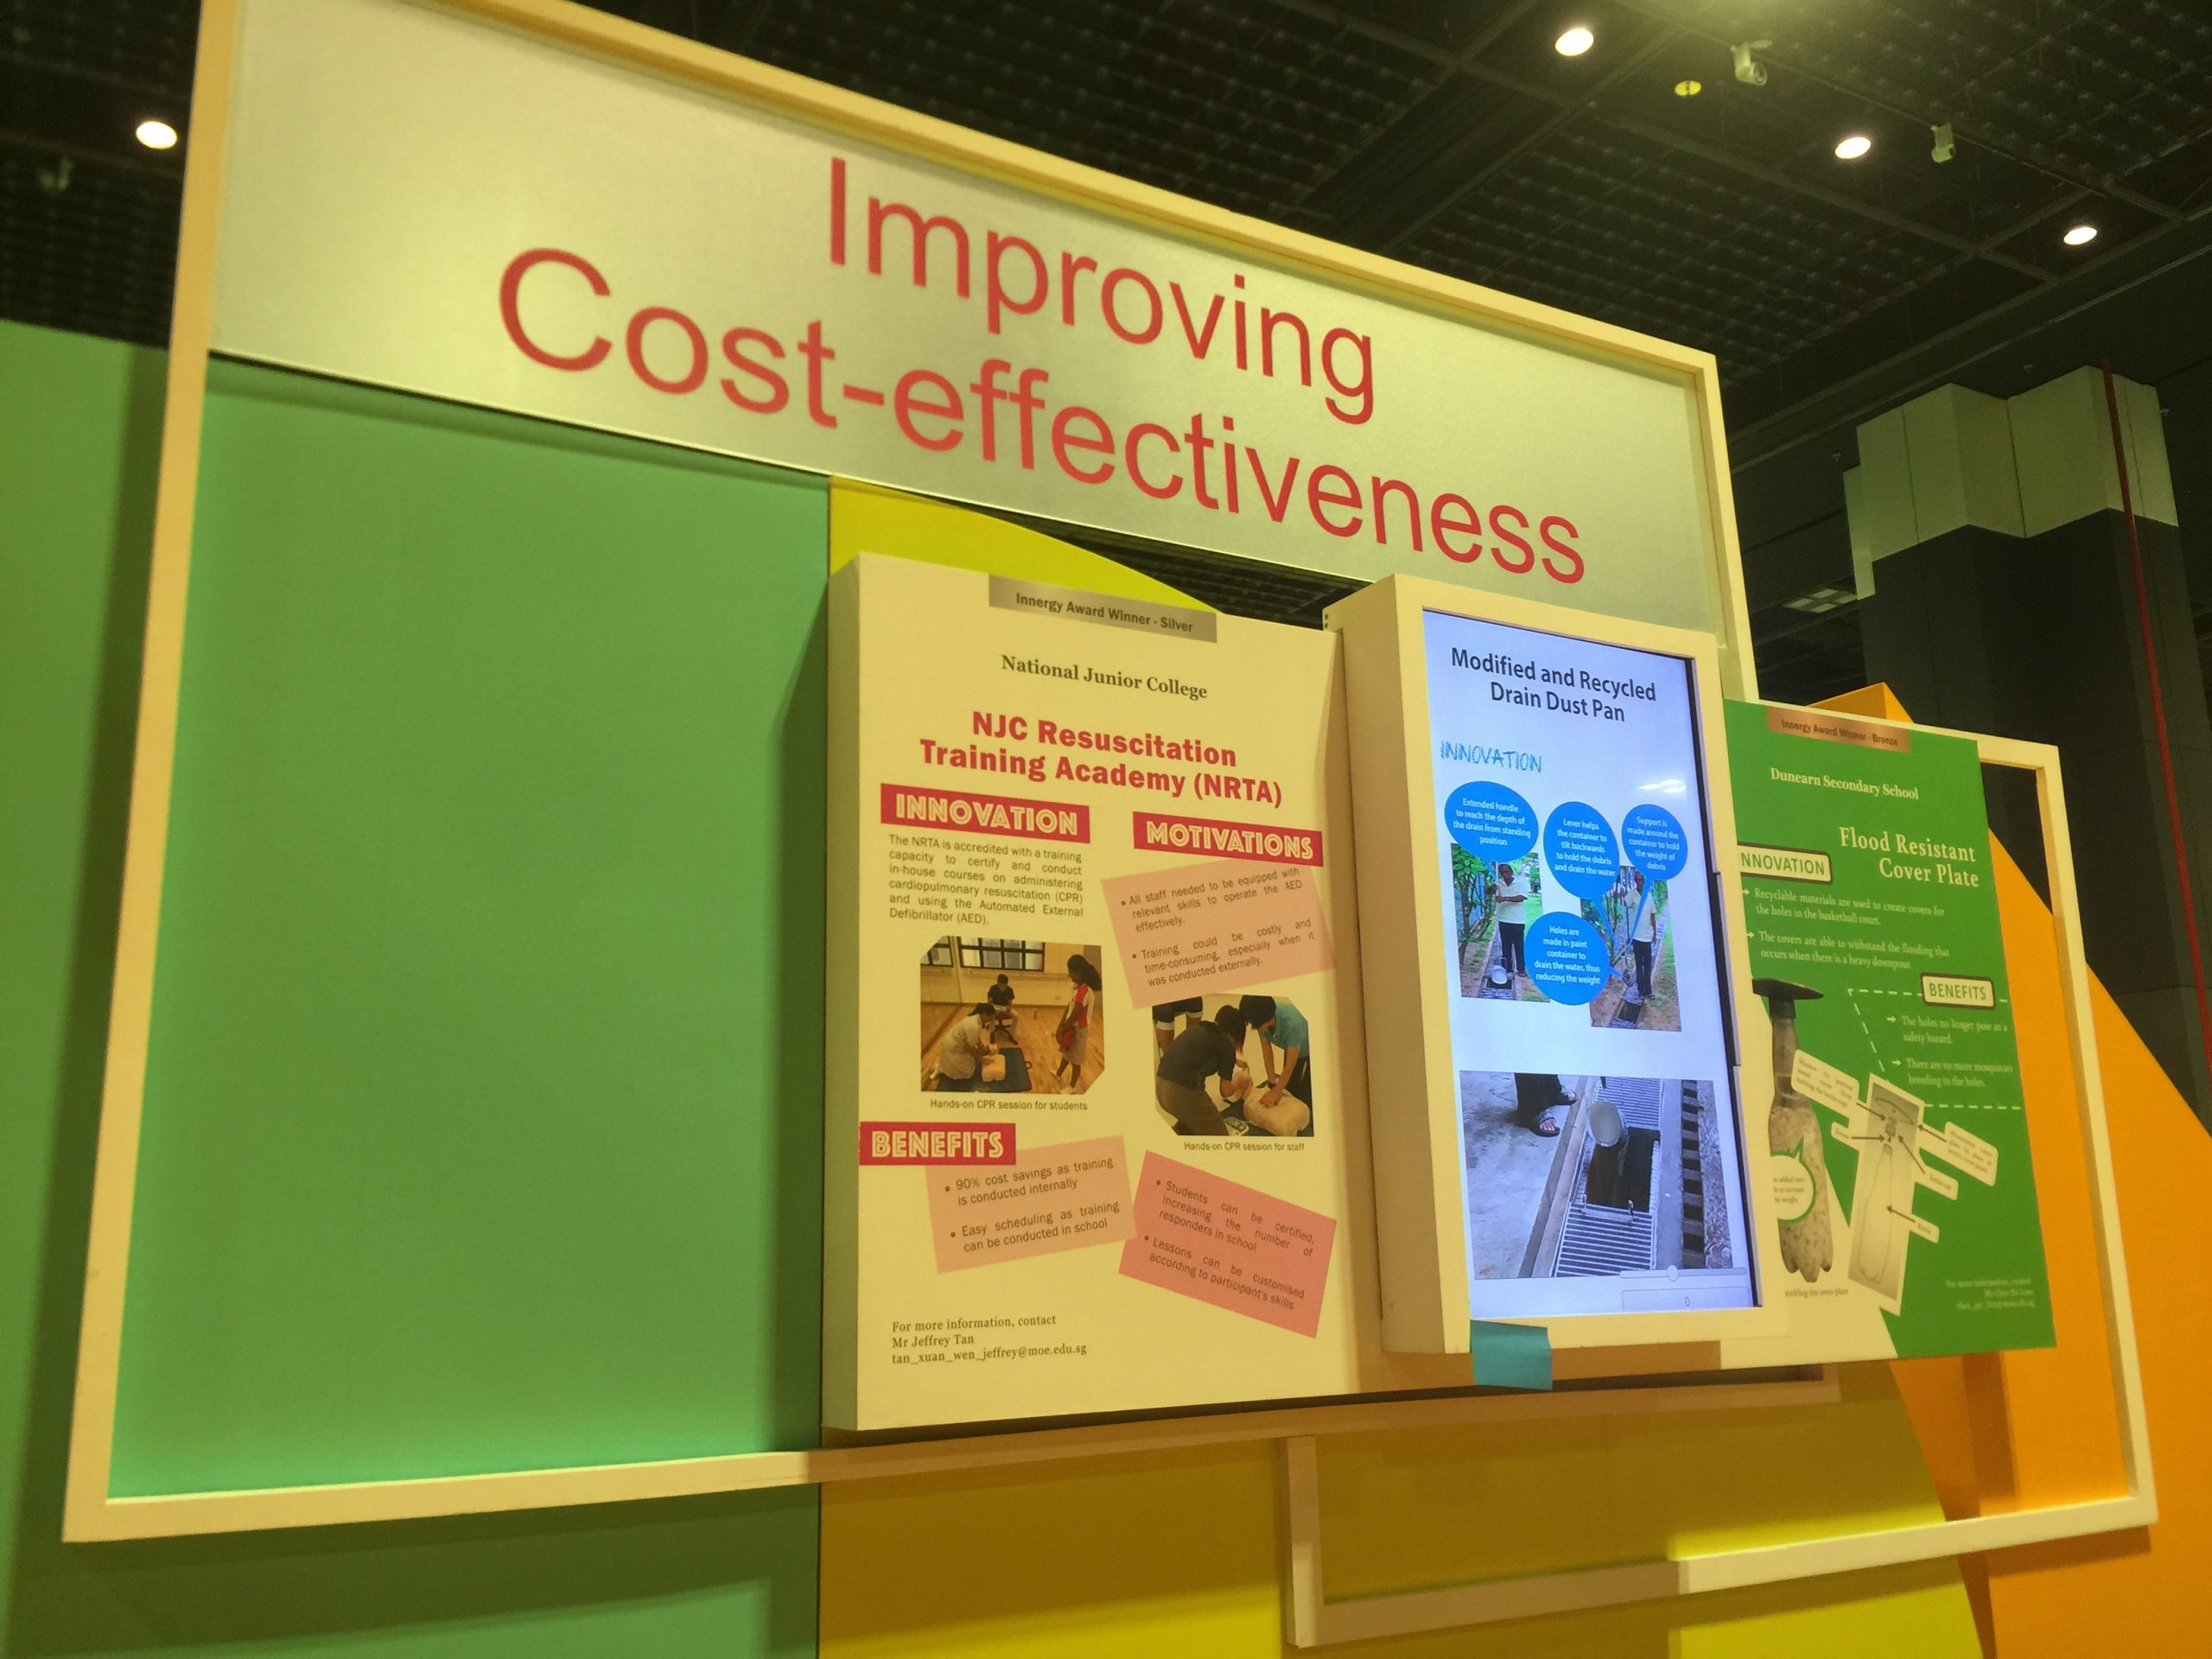 MOE Excel Fest Interactive Rotoscope Display